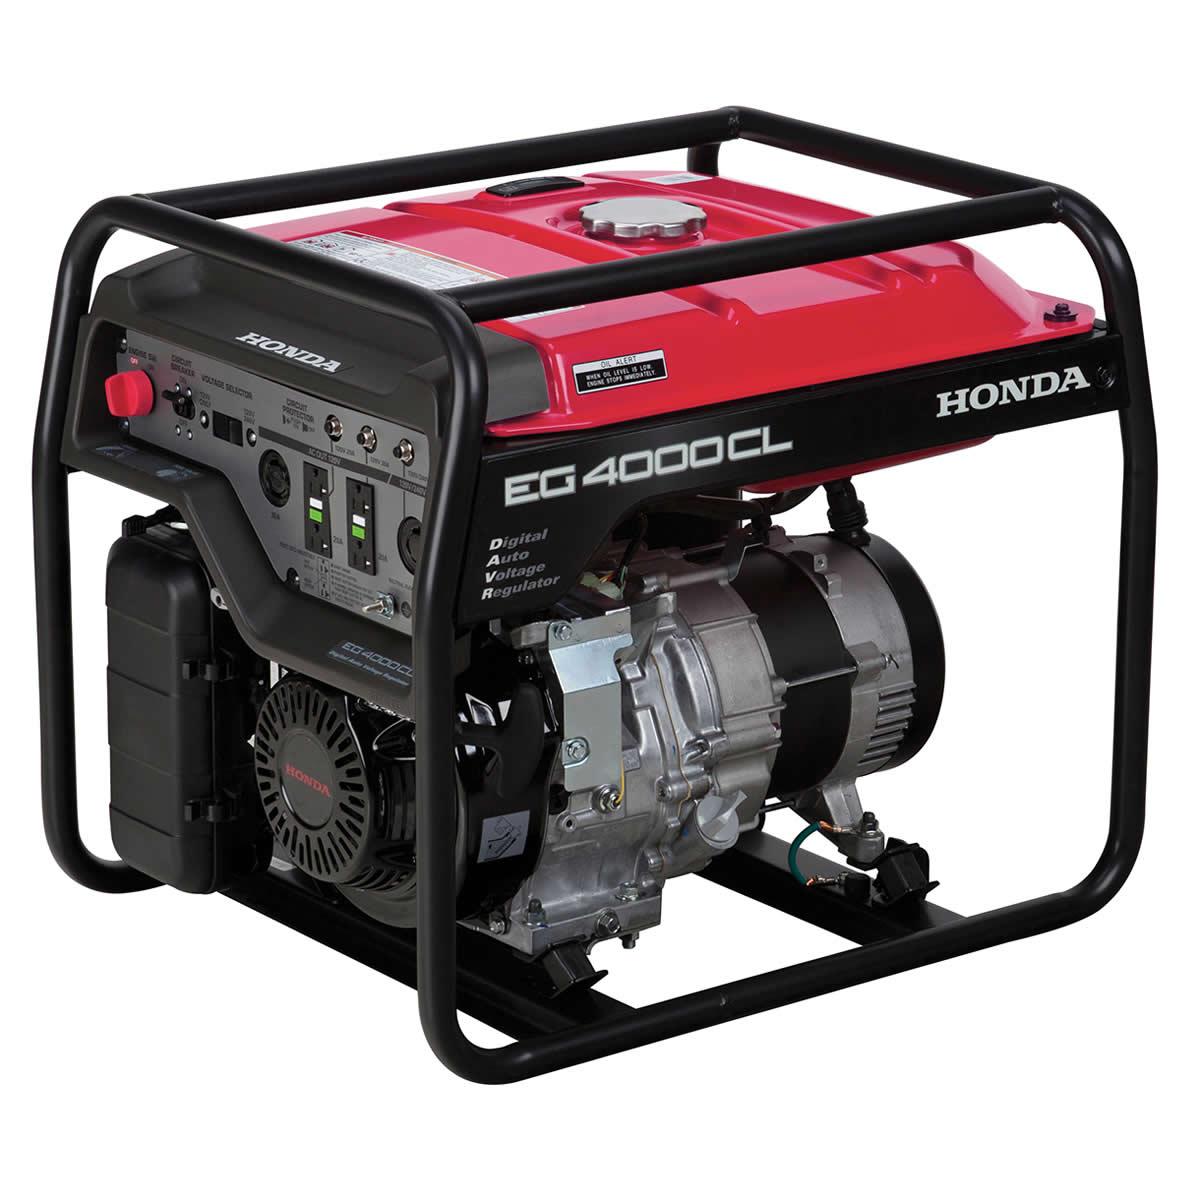 Picture of Honda EG Series EG4000CL1 Portable Generator, 29.2/14.6 A, 120/240 V, Gasoline, 6.3 gal Tank, 9.4 hr Run Time